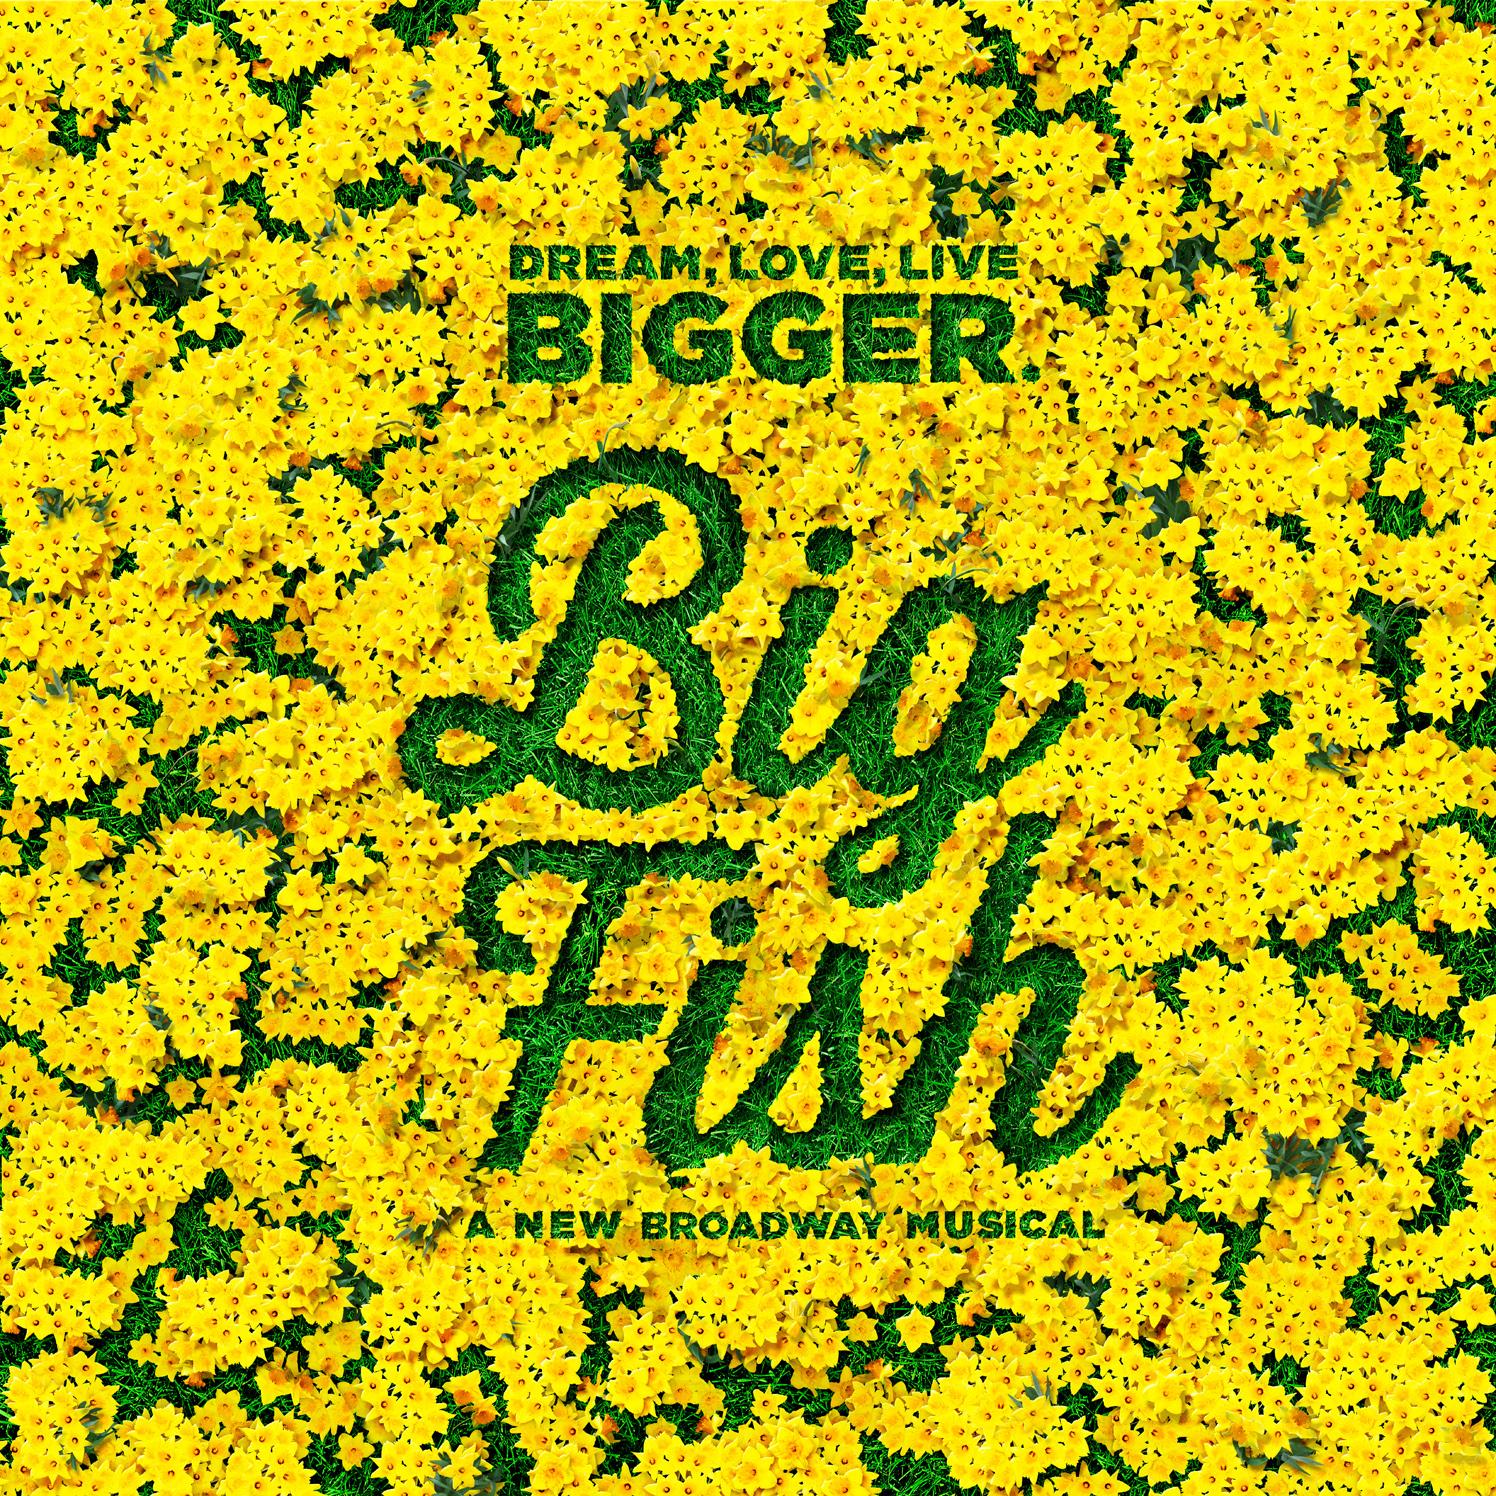 Bigger Fish